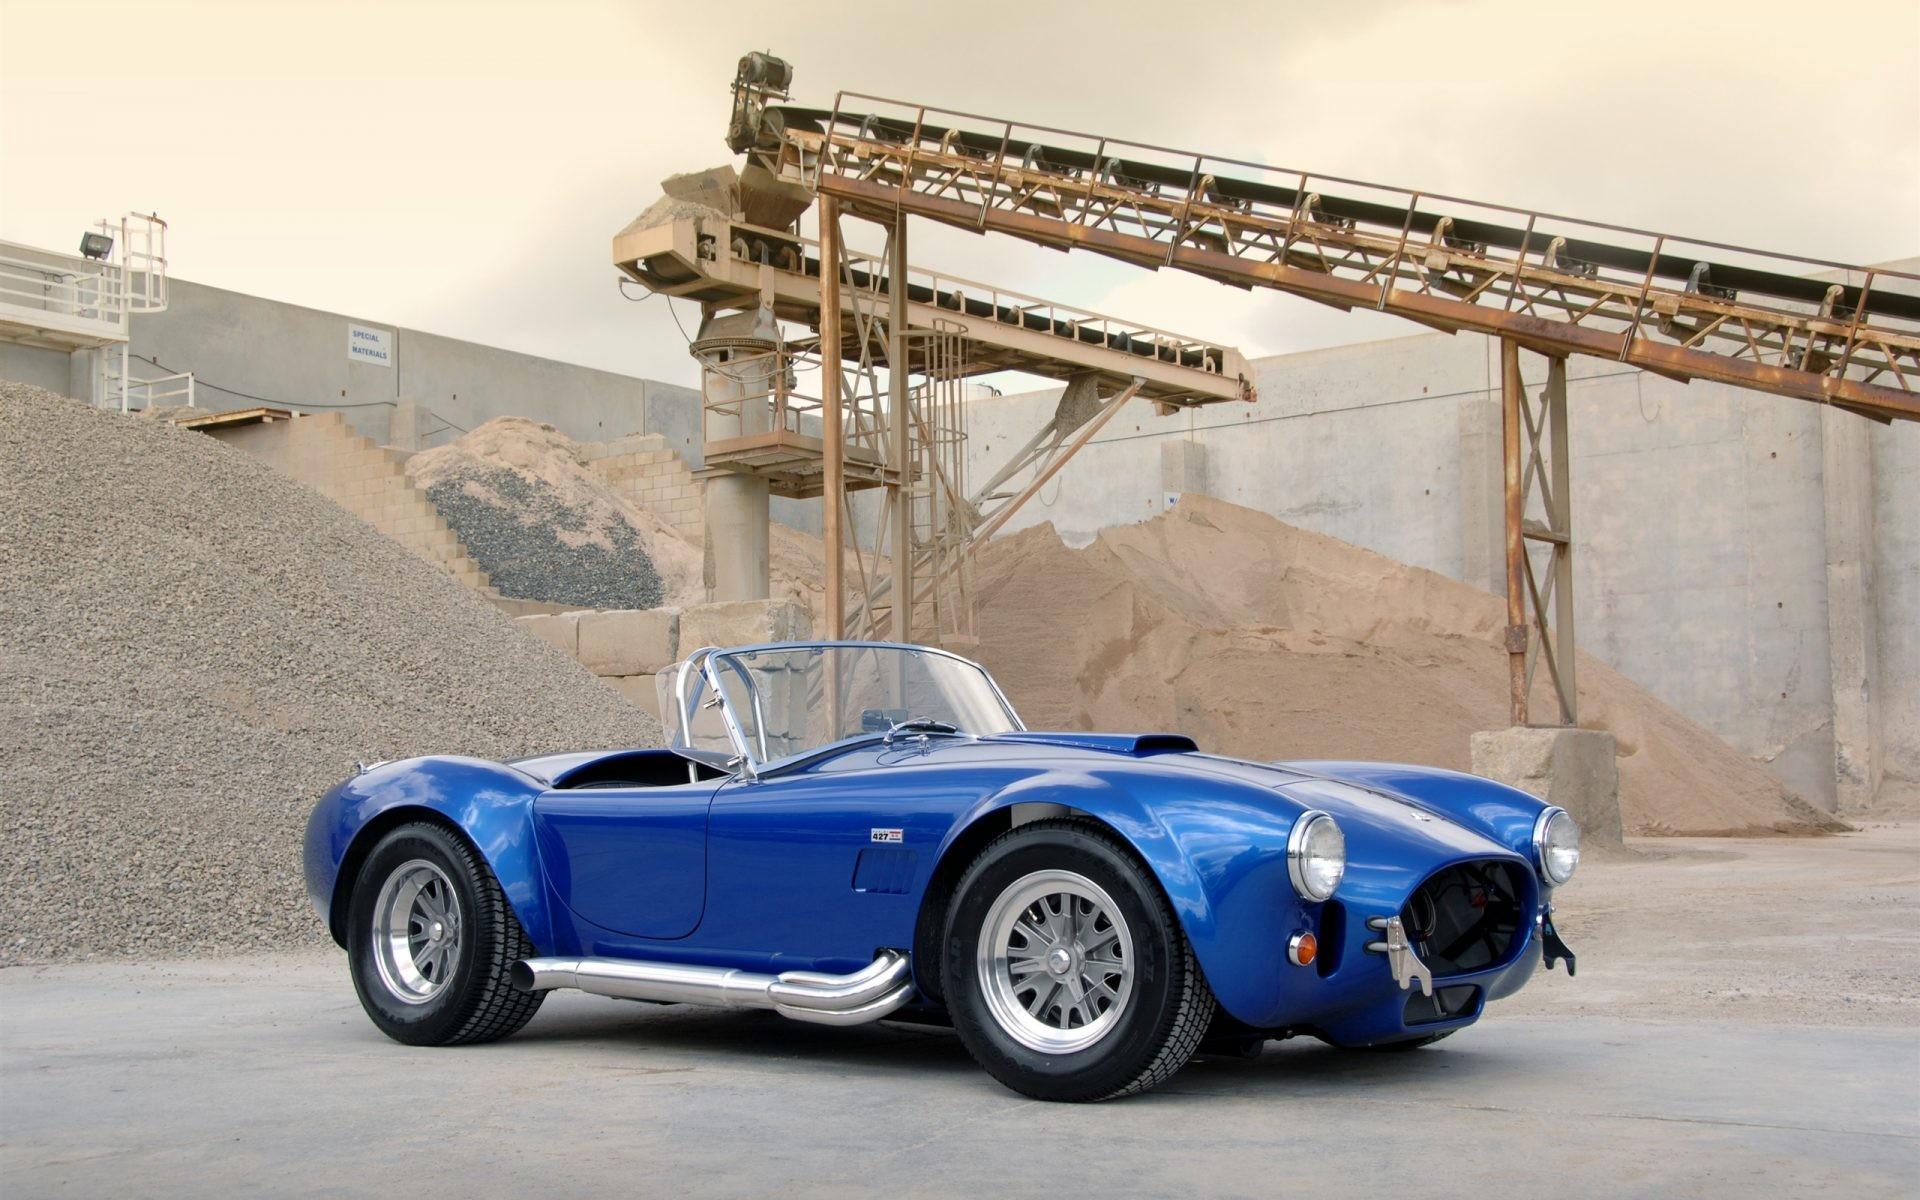 1963 Shelby Cobra CSX 4000 427 SC blue car Full HD wallpaper